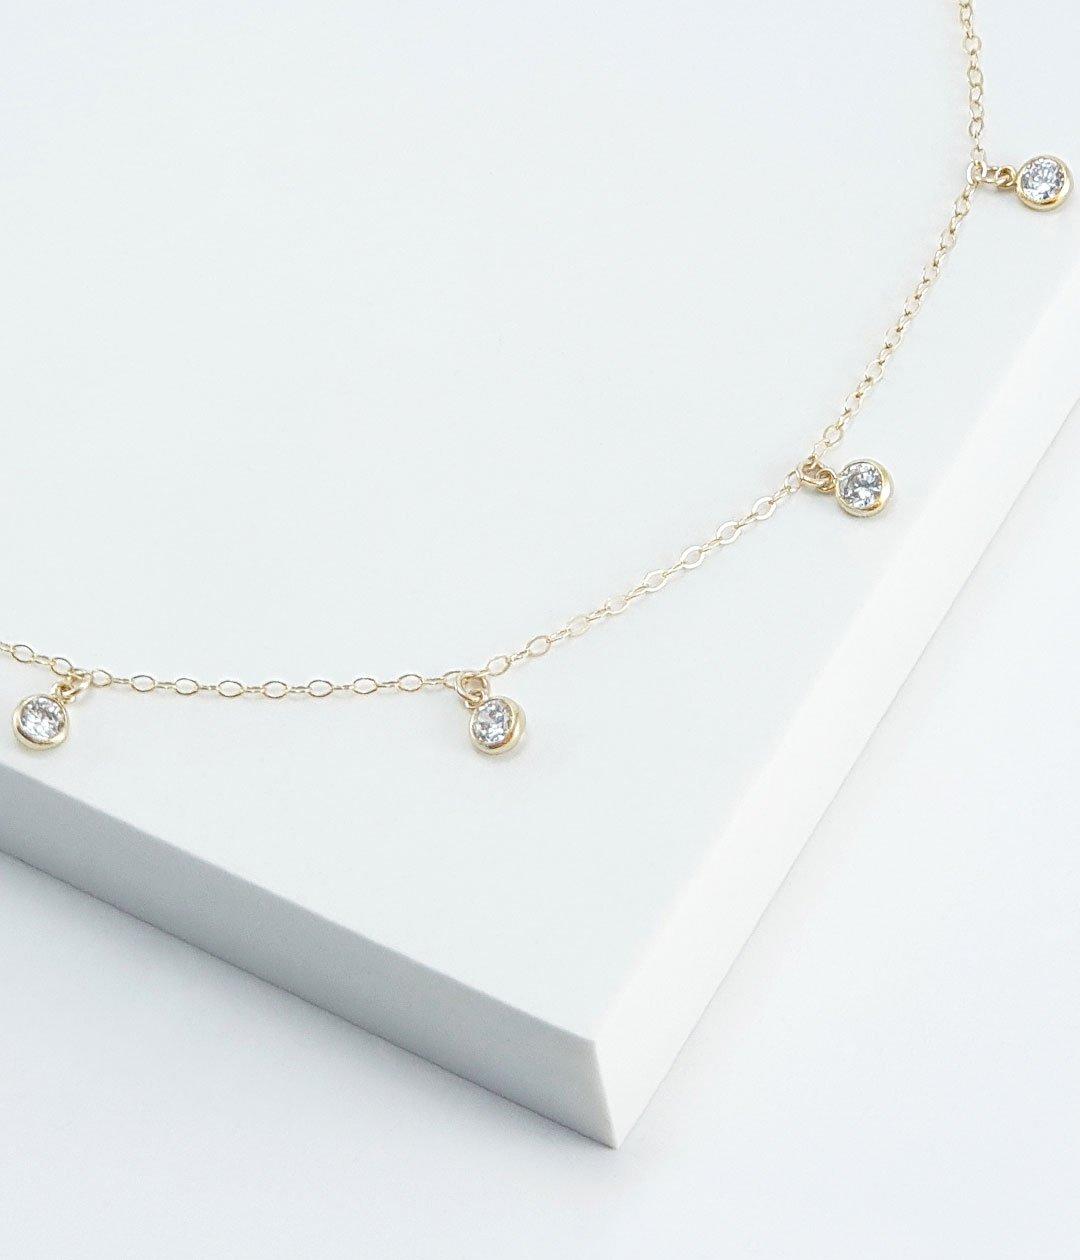 drop-cz-necklace-zoom